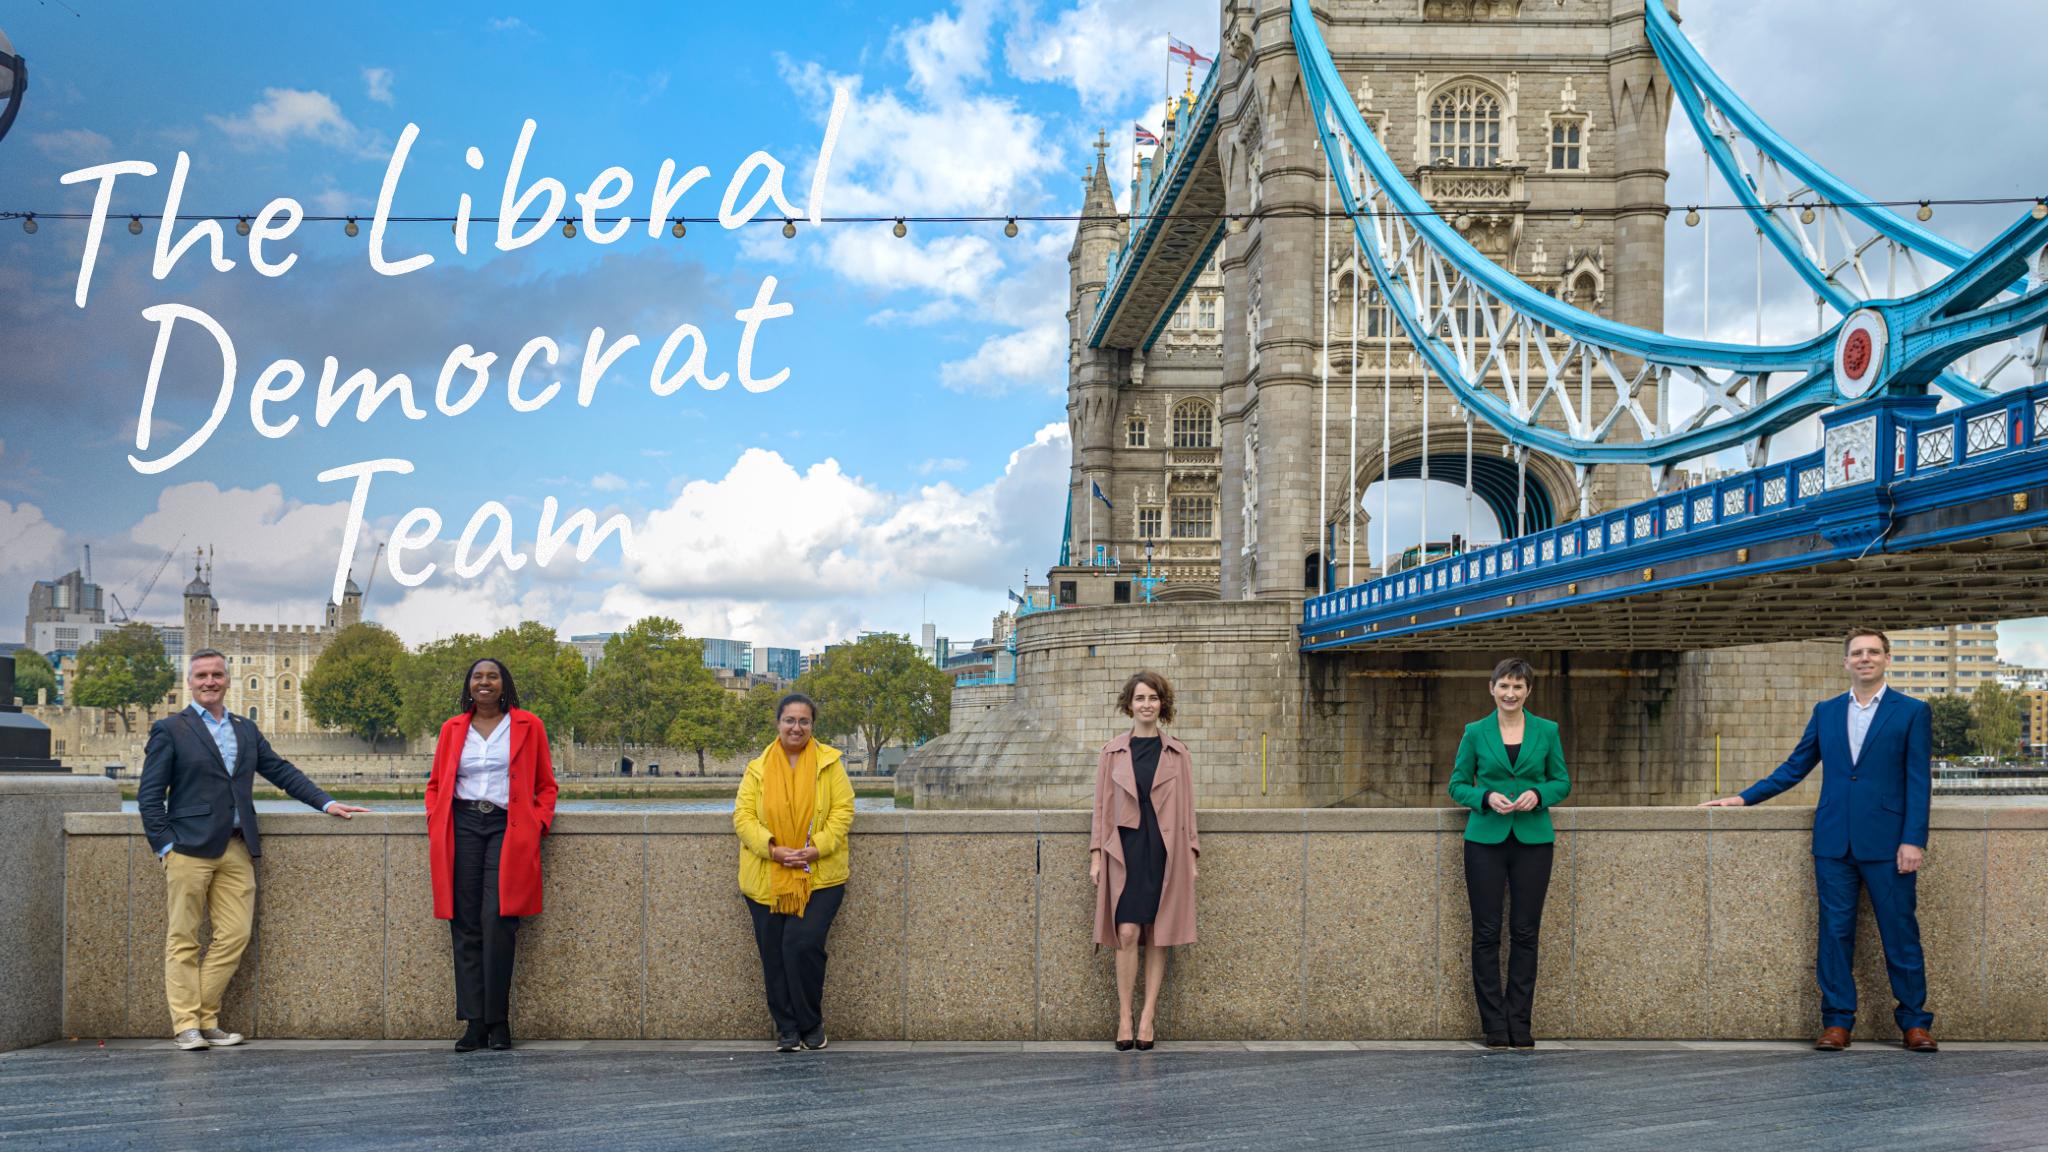 Our Liberal Democrat Team